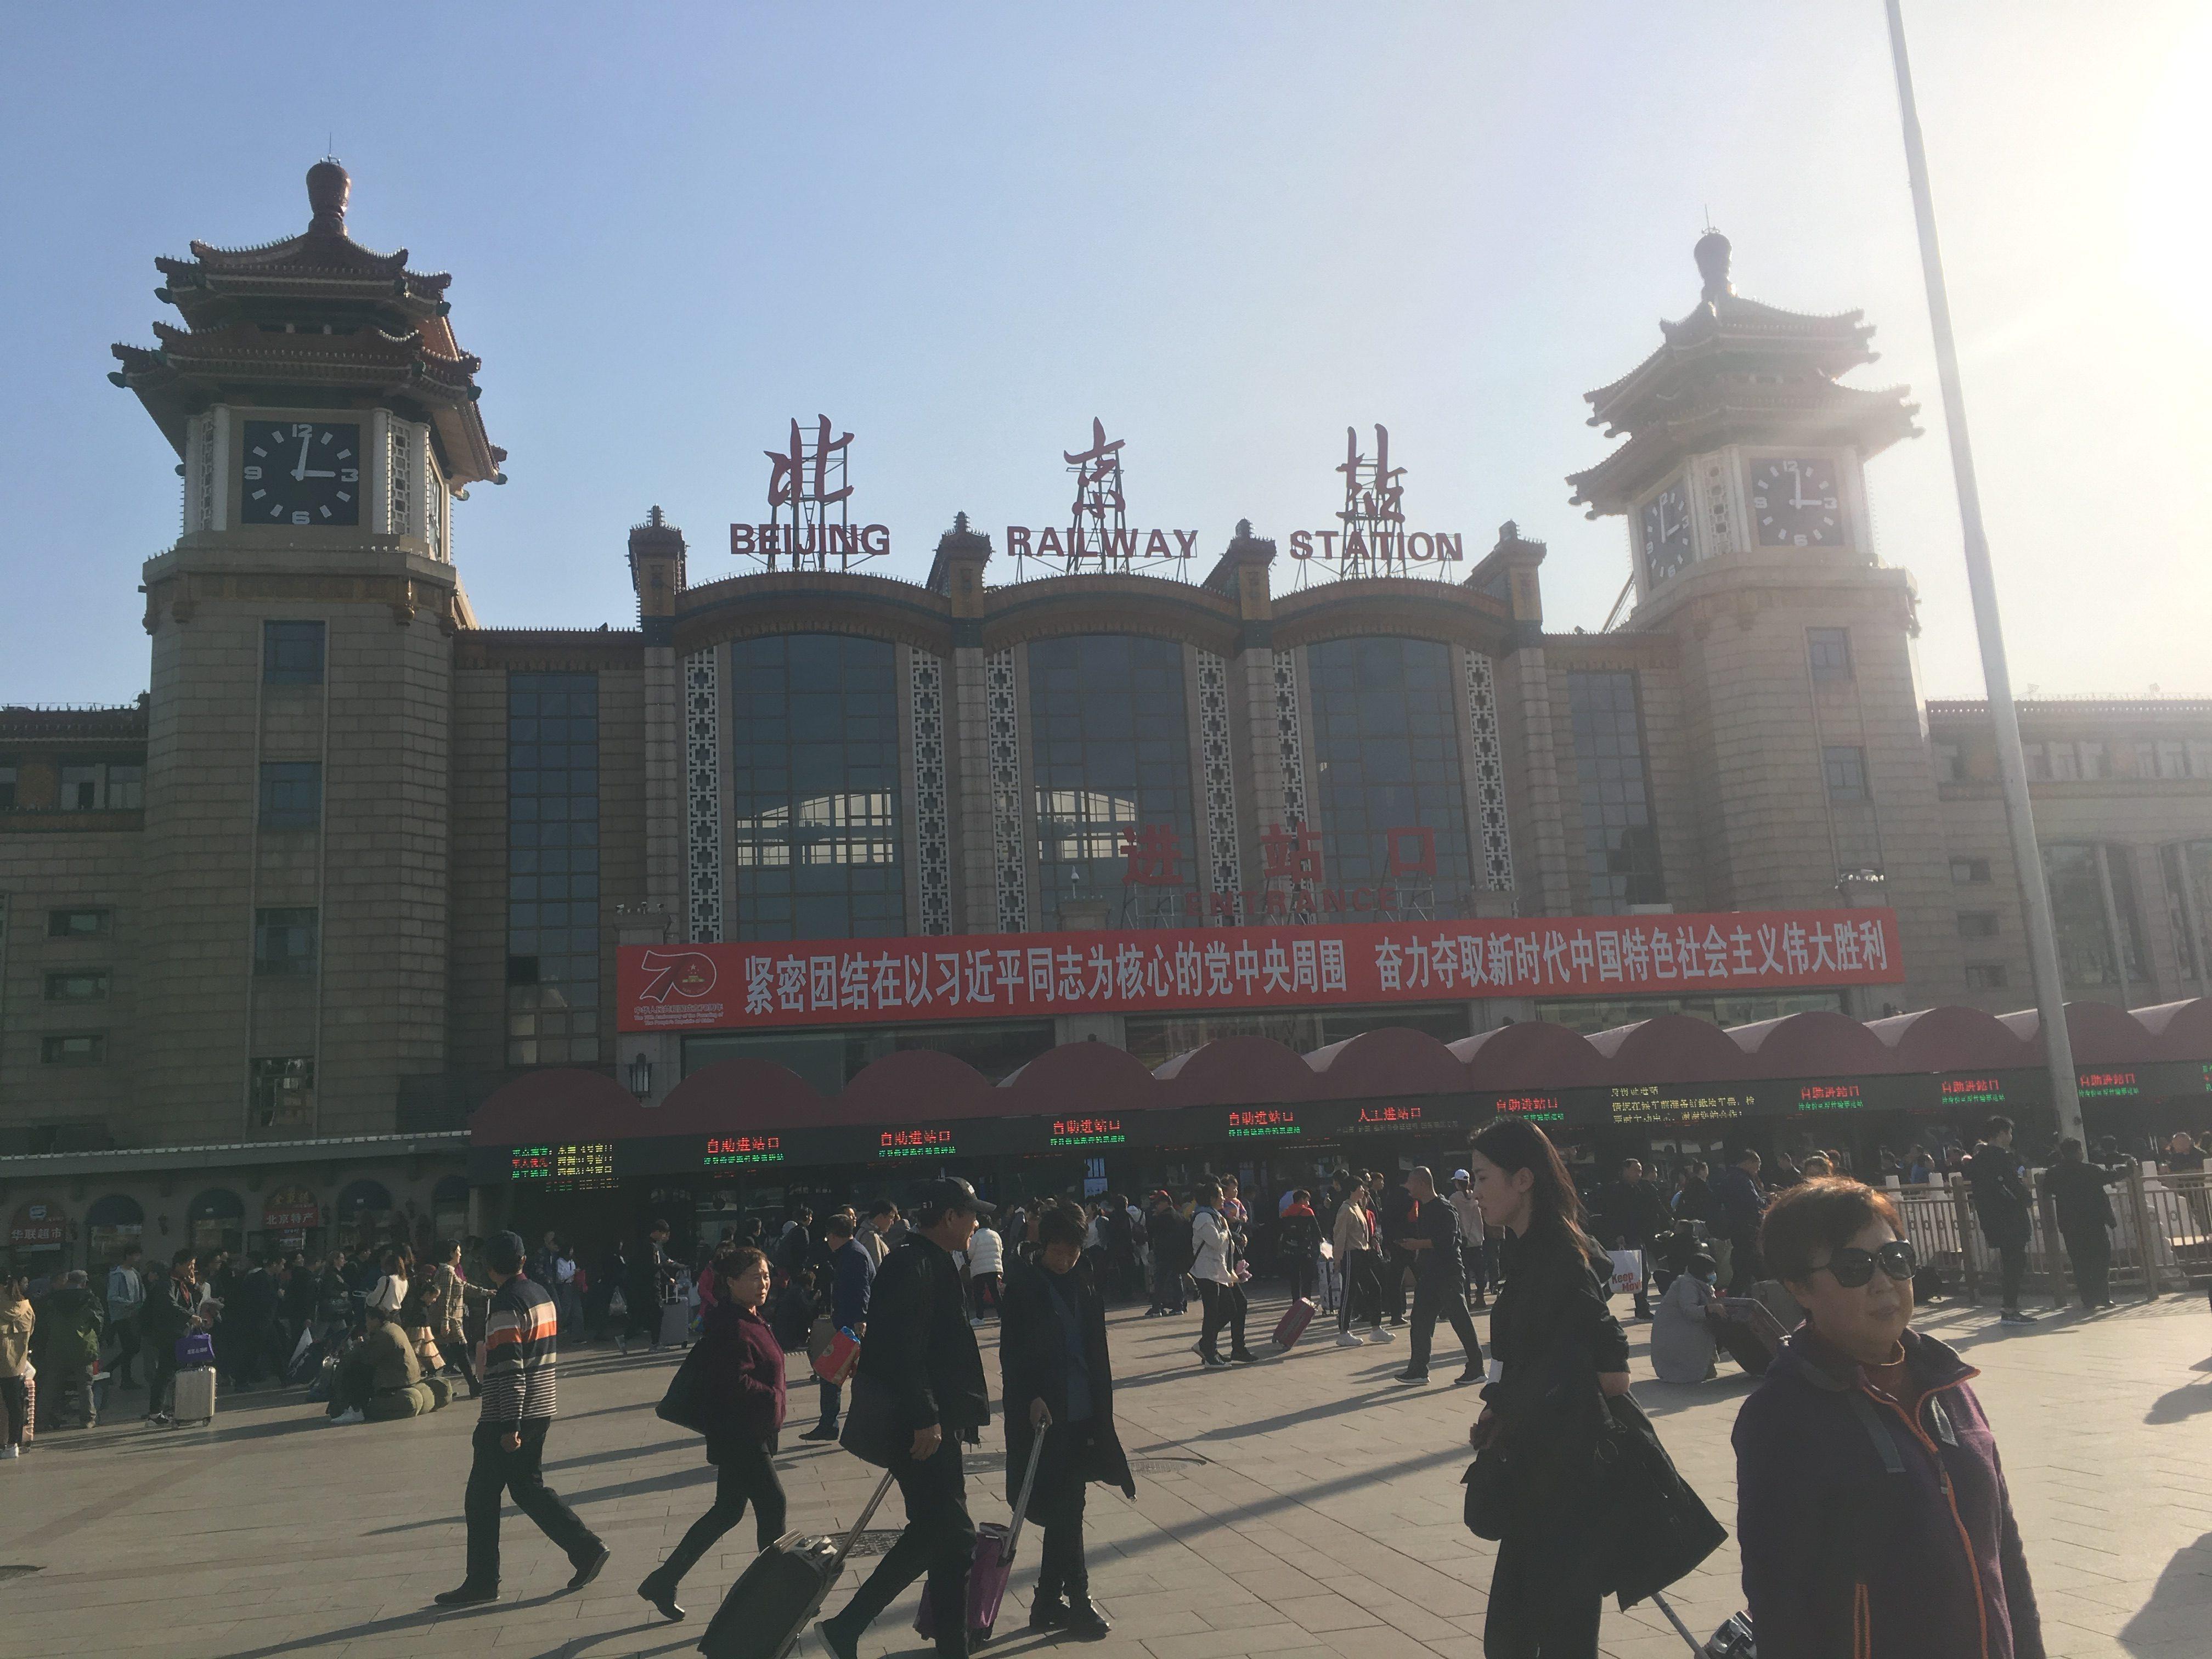 Beijing Railway Station Plaza - free!